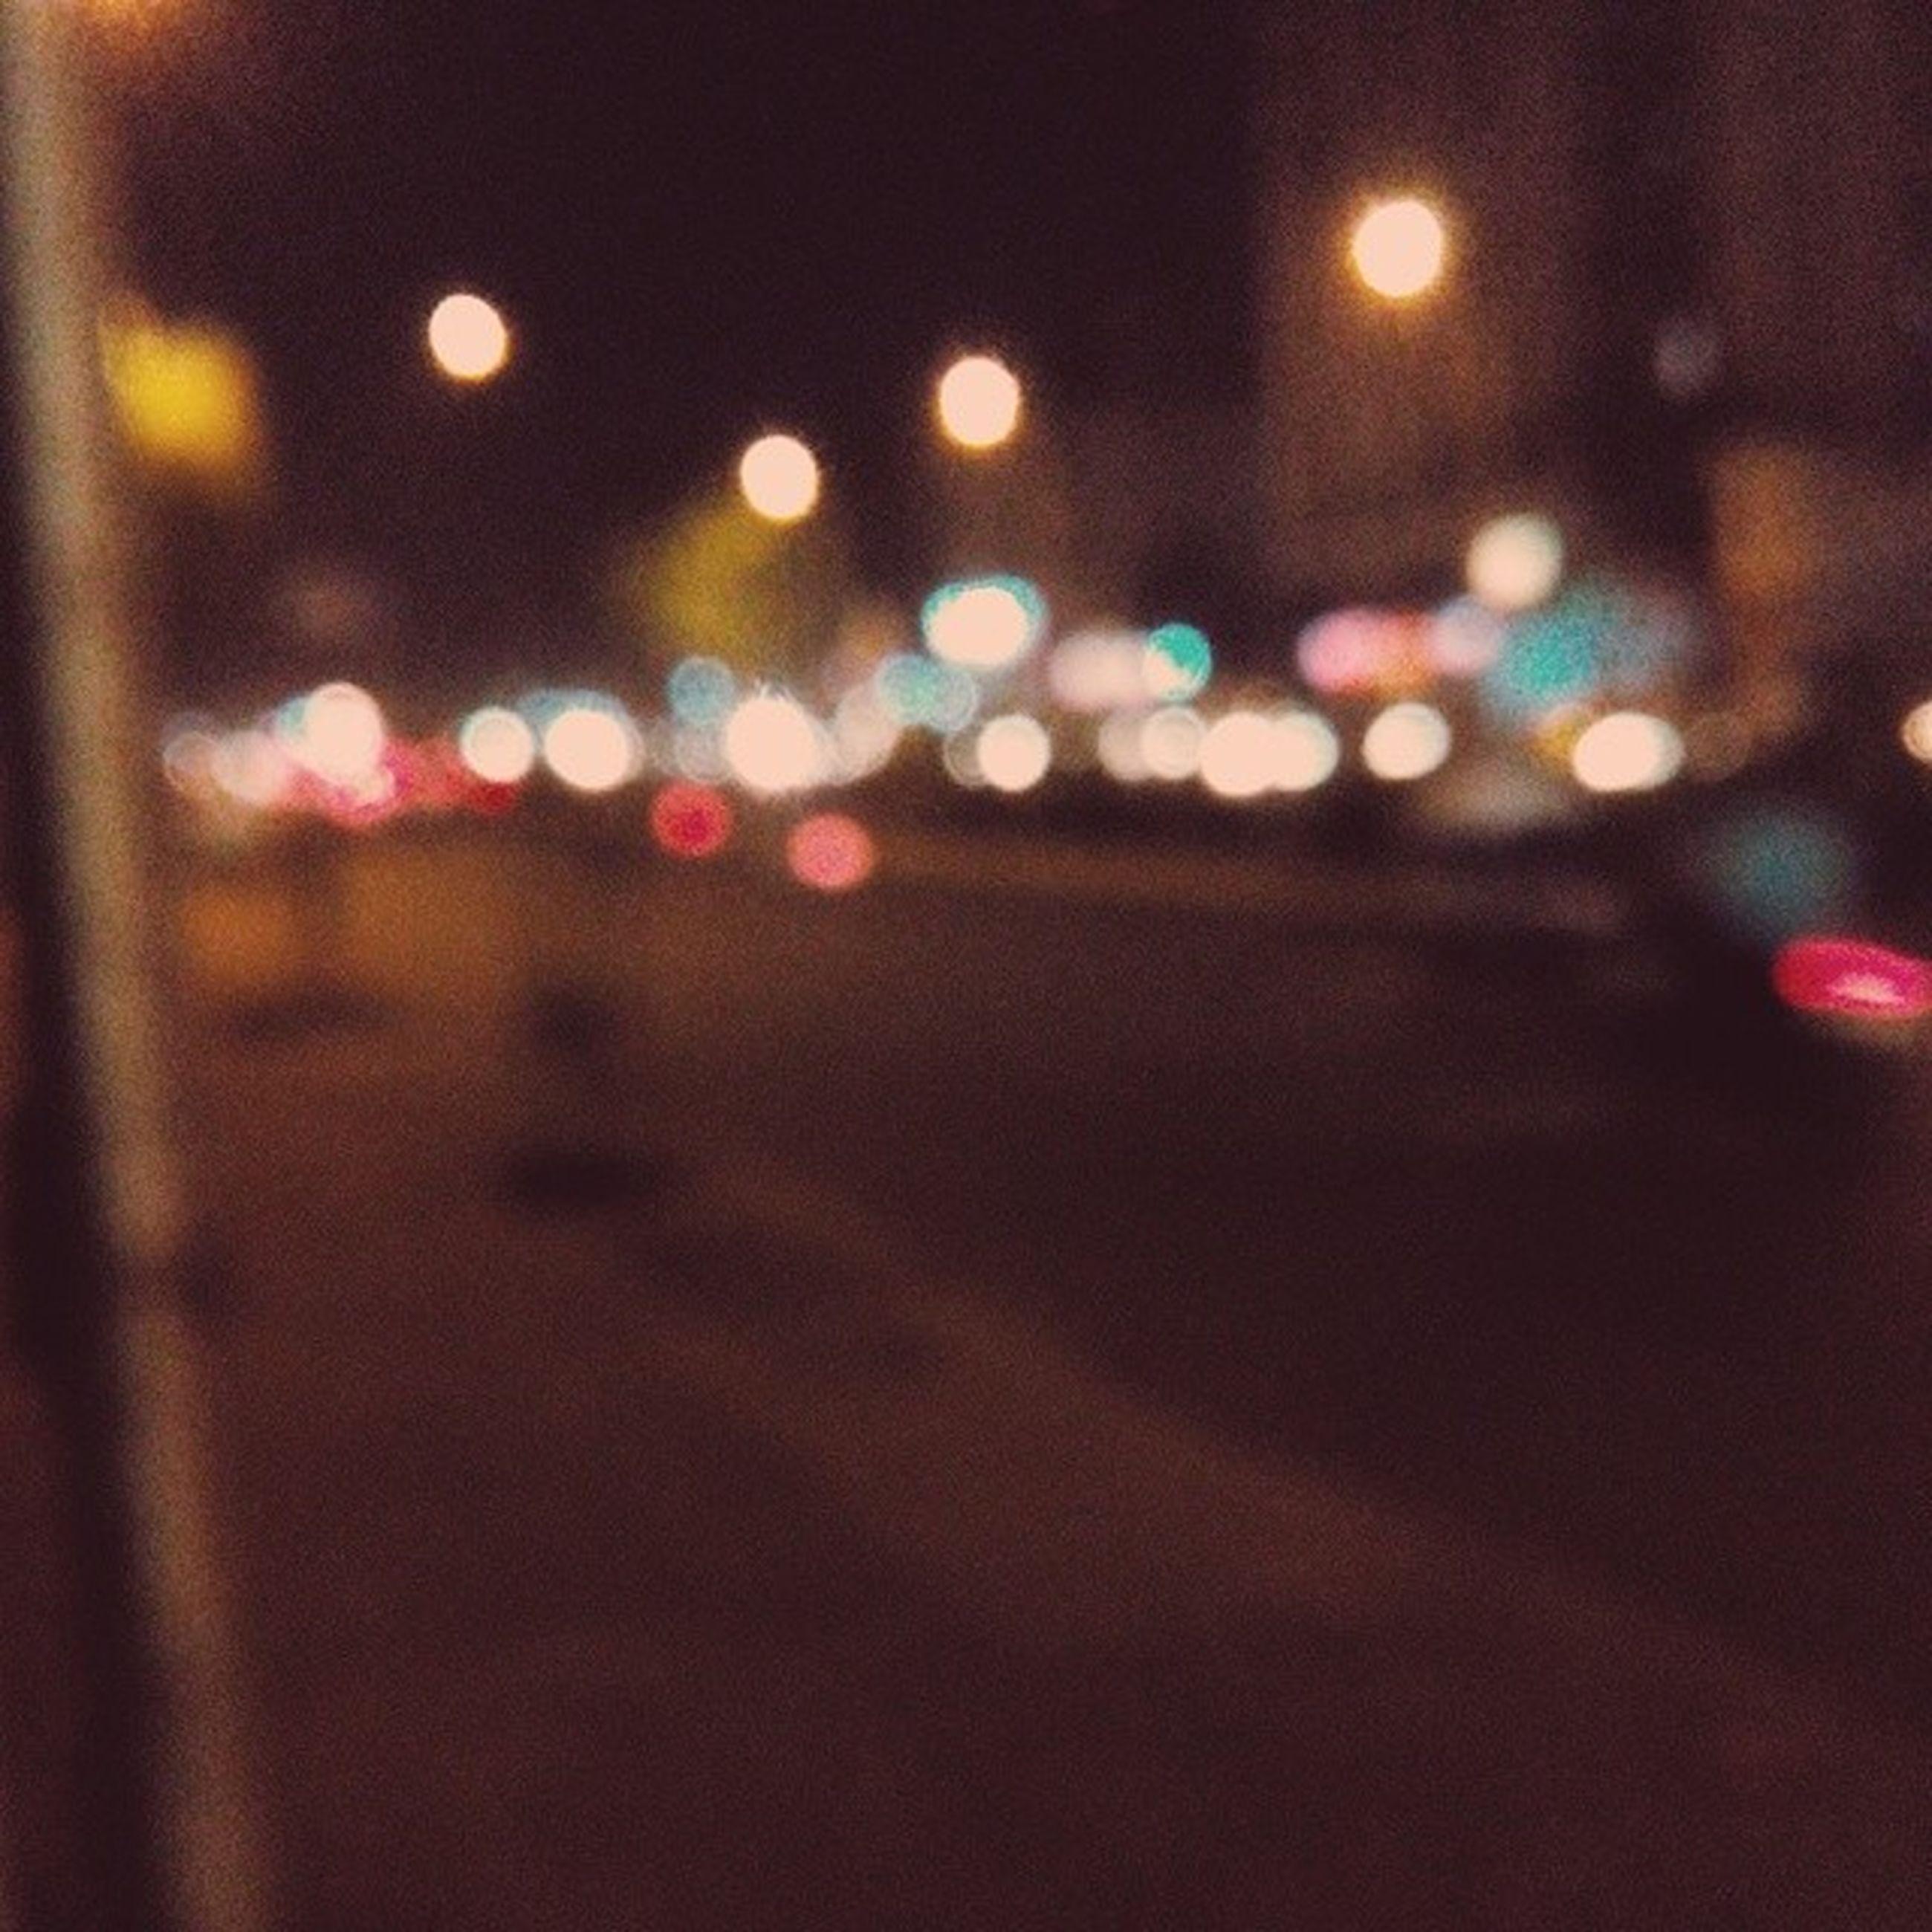 illuminated, night, defocused, multi colored, lighting equipment, street, transportation, light - natural phenomenon, city, lens flare, no people, road, outdoors, street light, red, circle, car, pattern, glowing, close-up